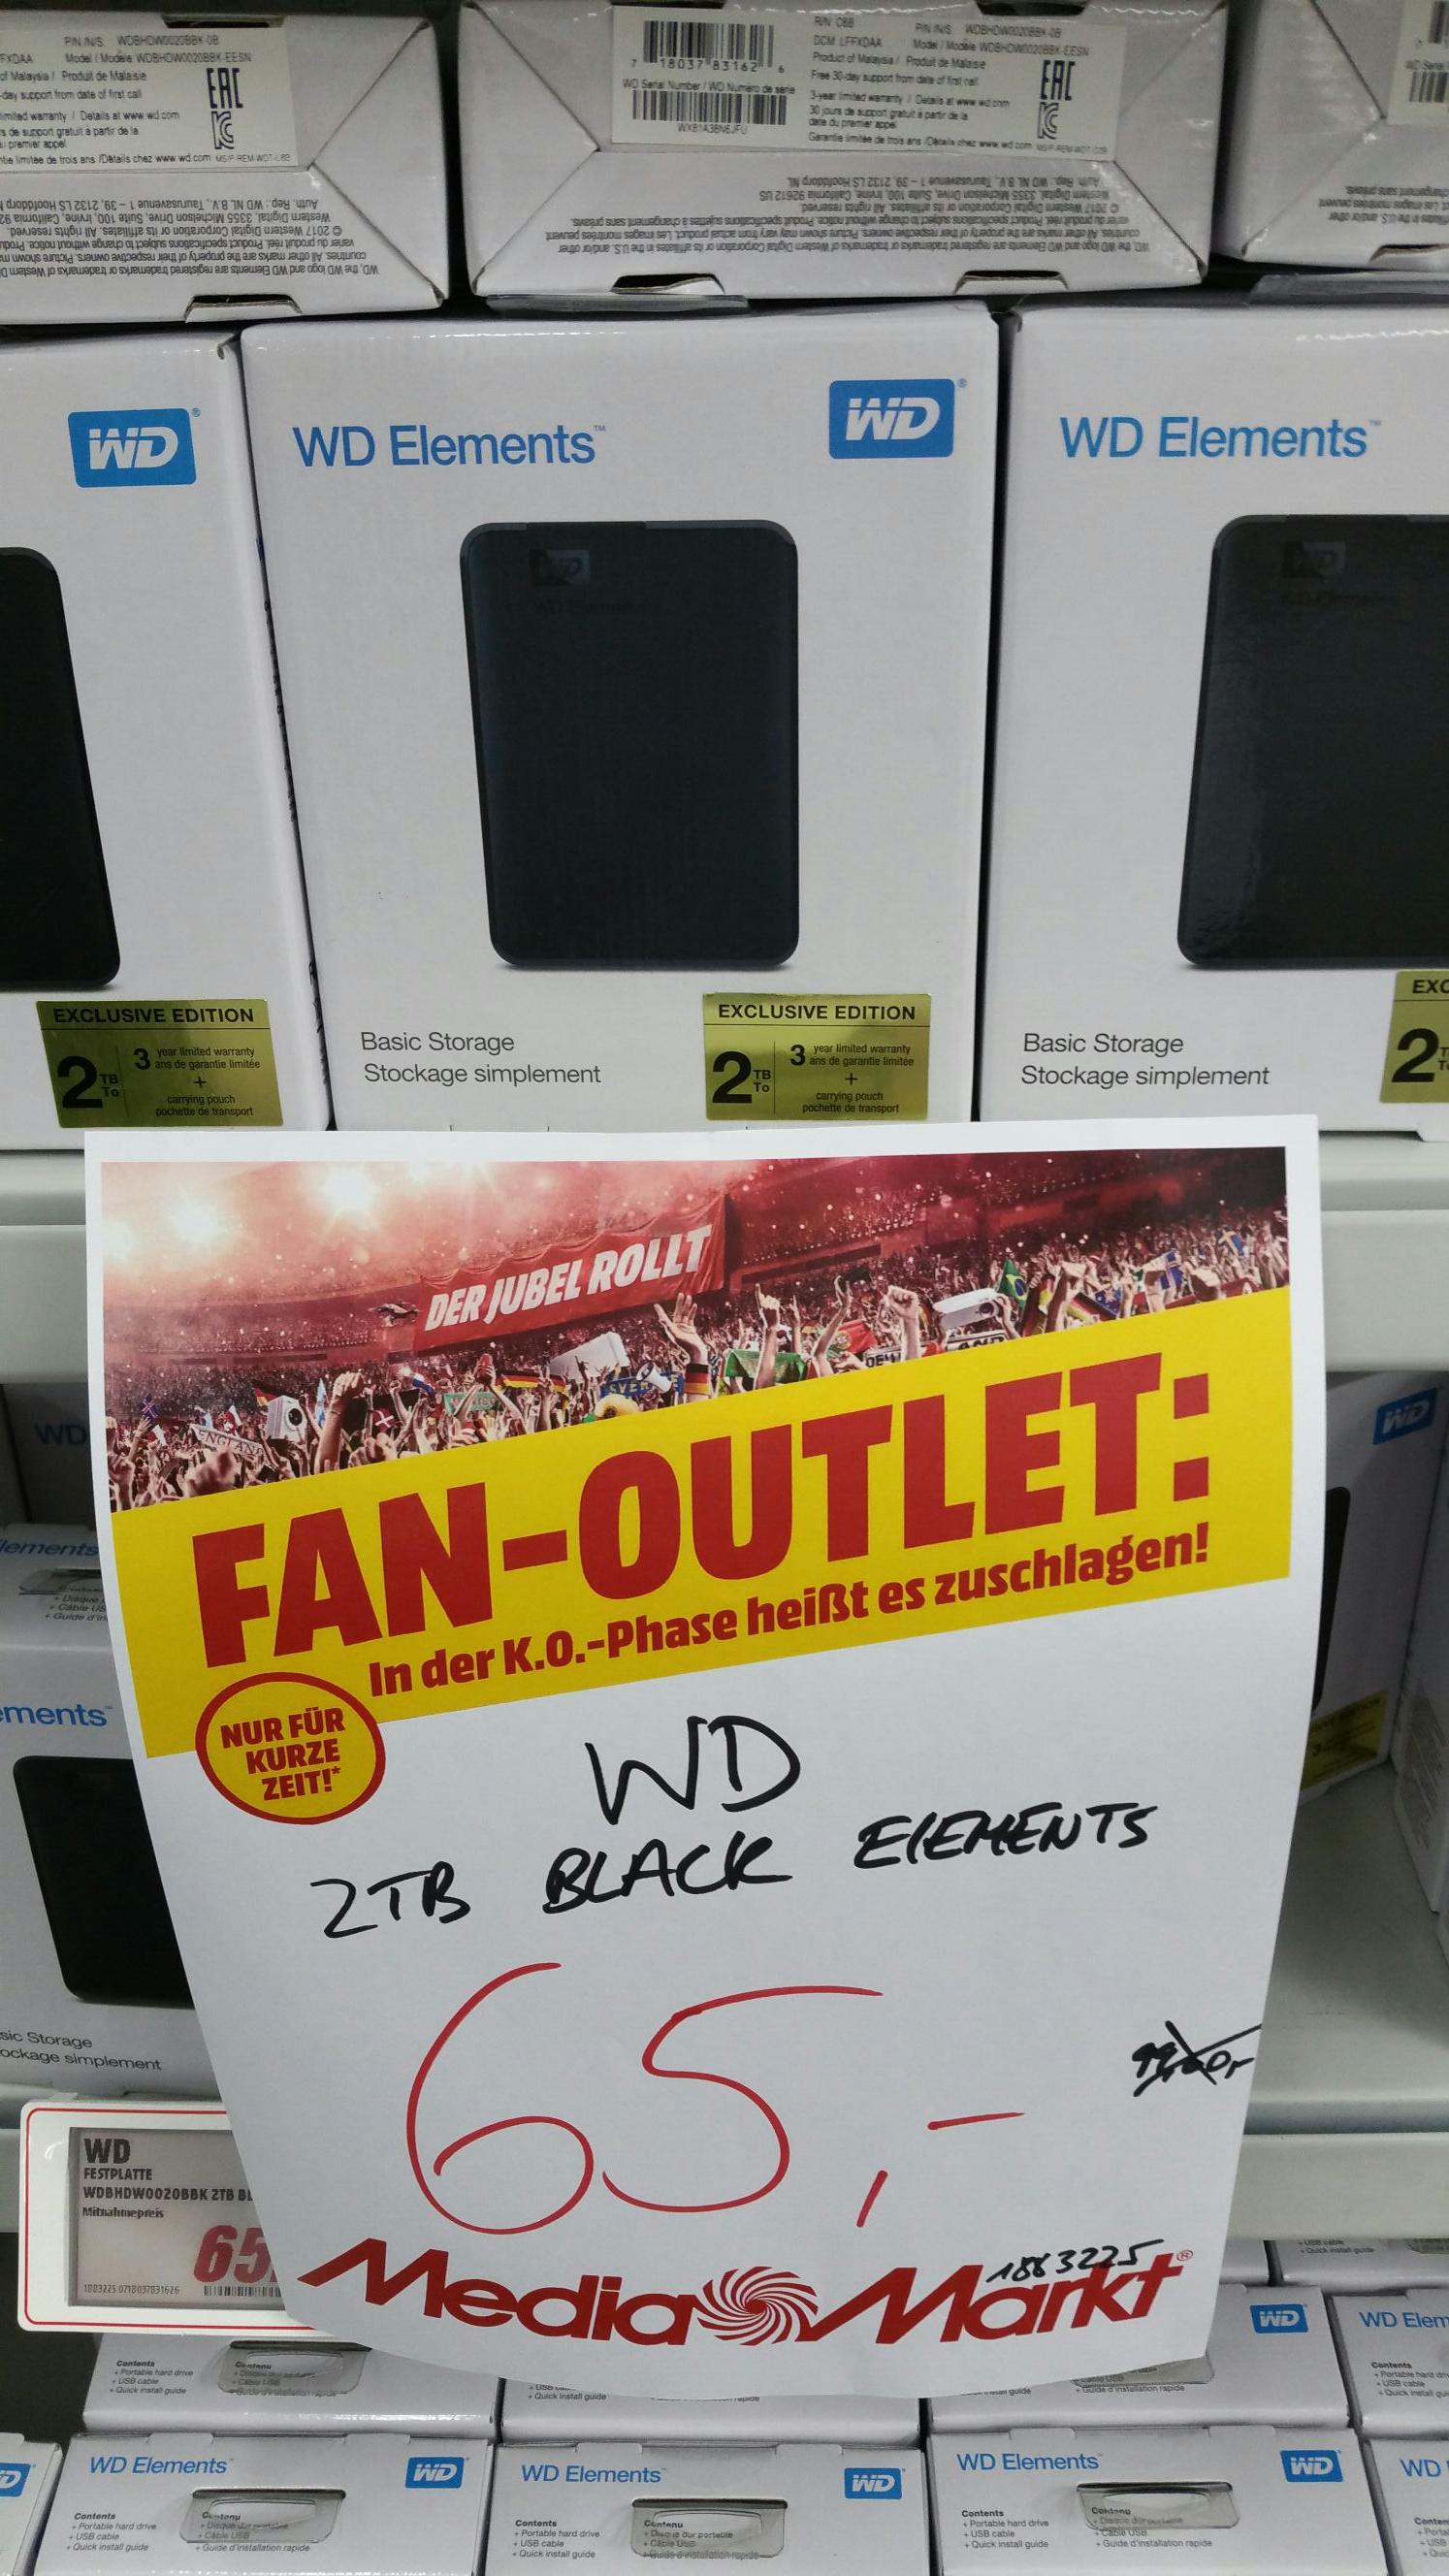 2TB WD Elements 2.5 externe USB 3.0 Festplatte